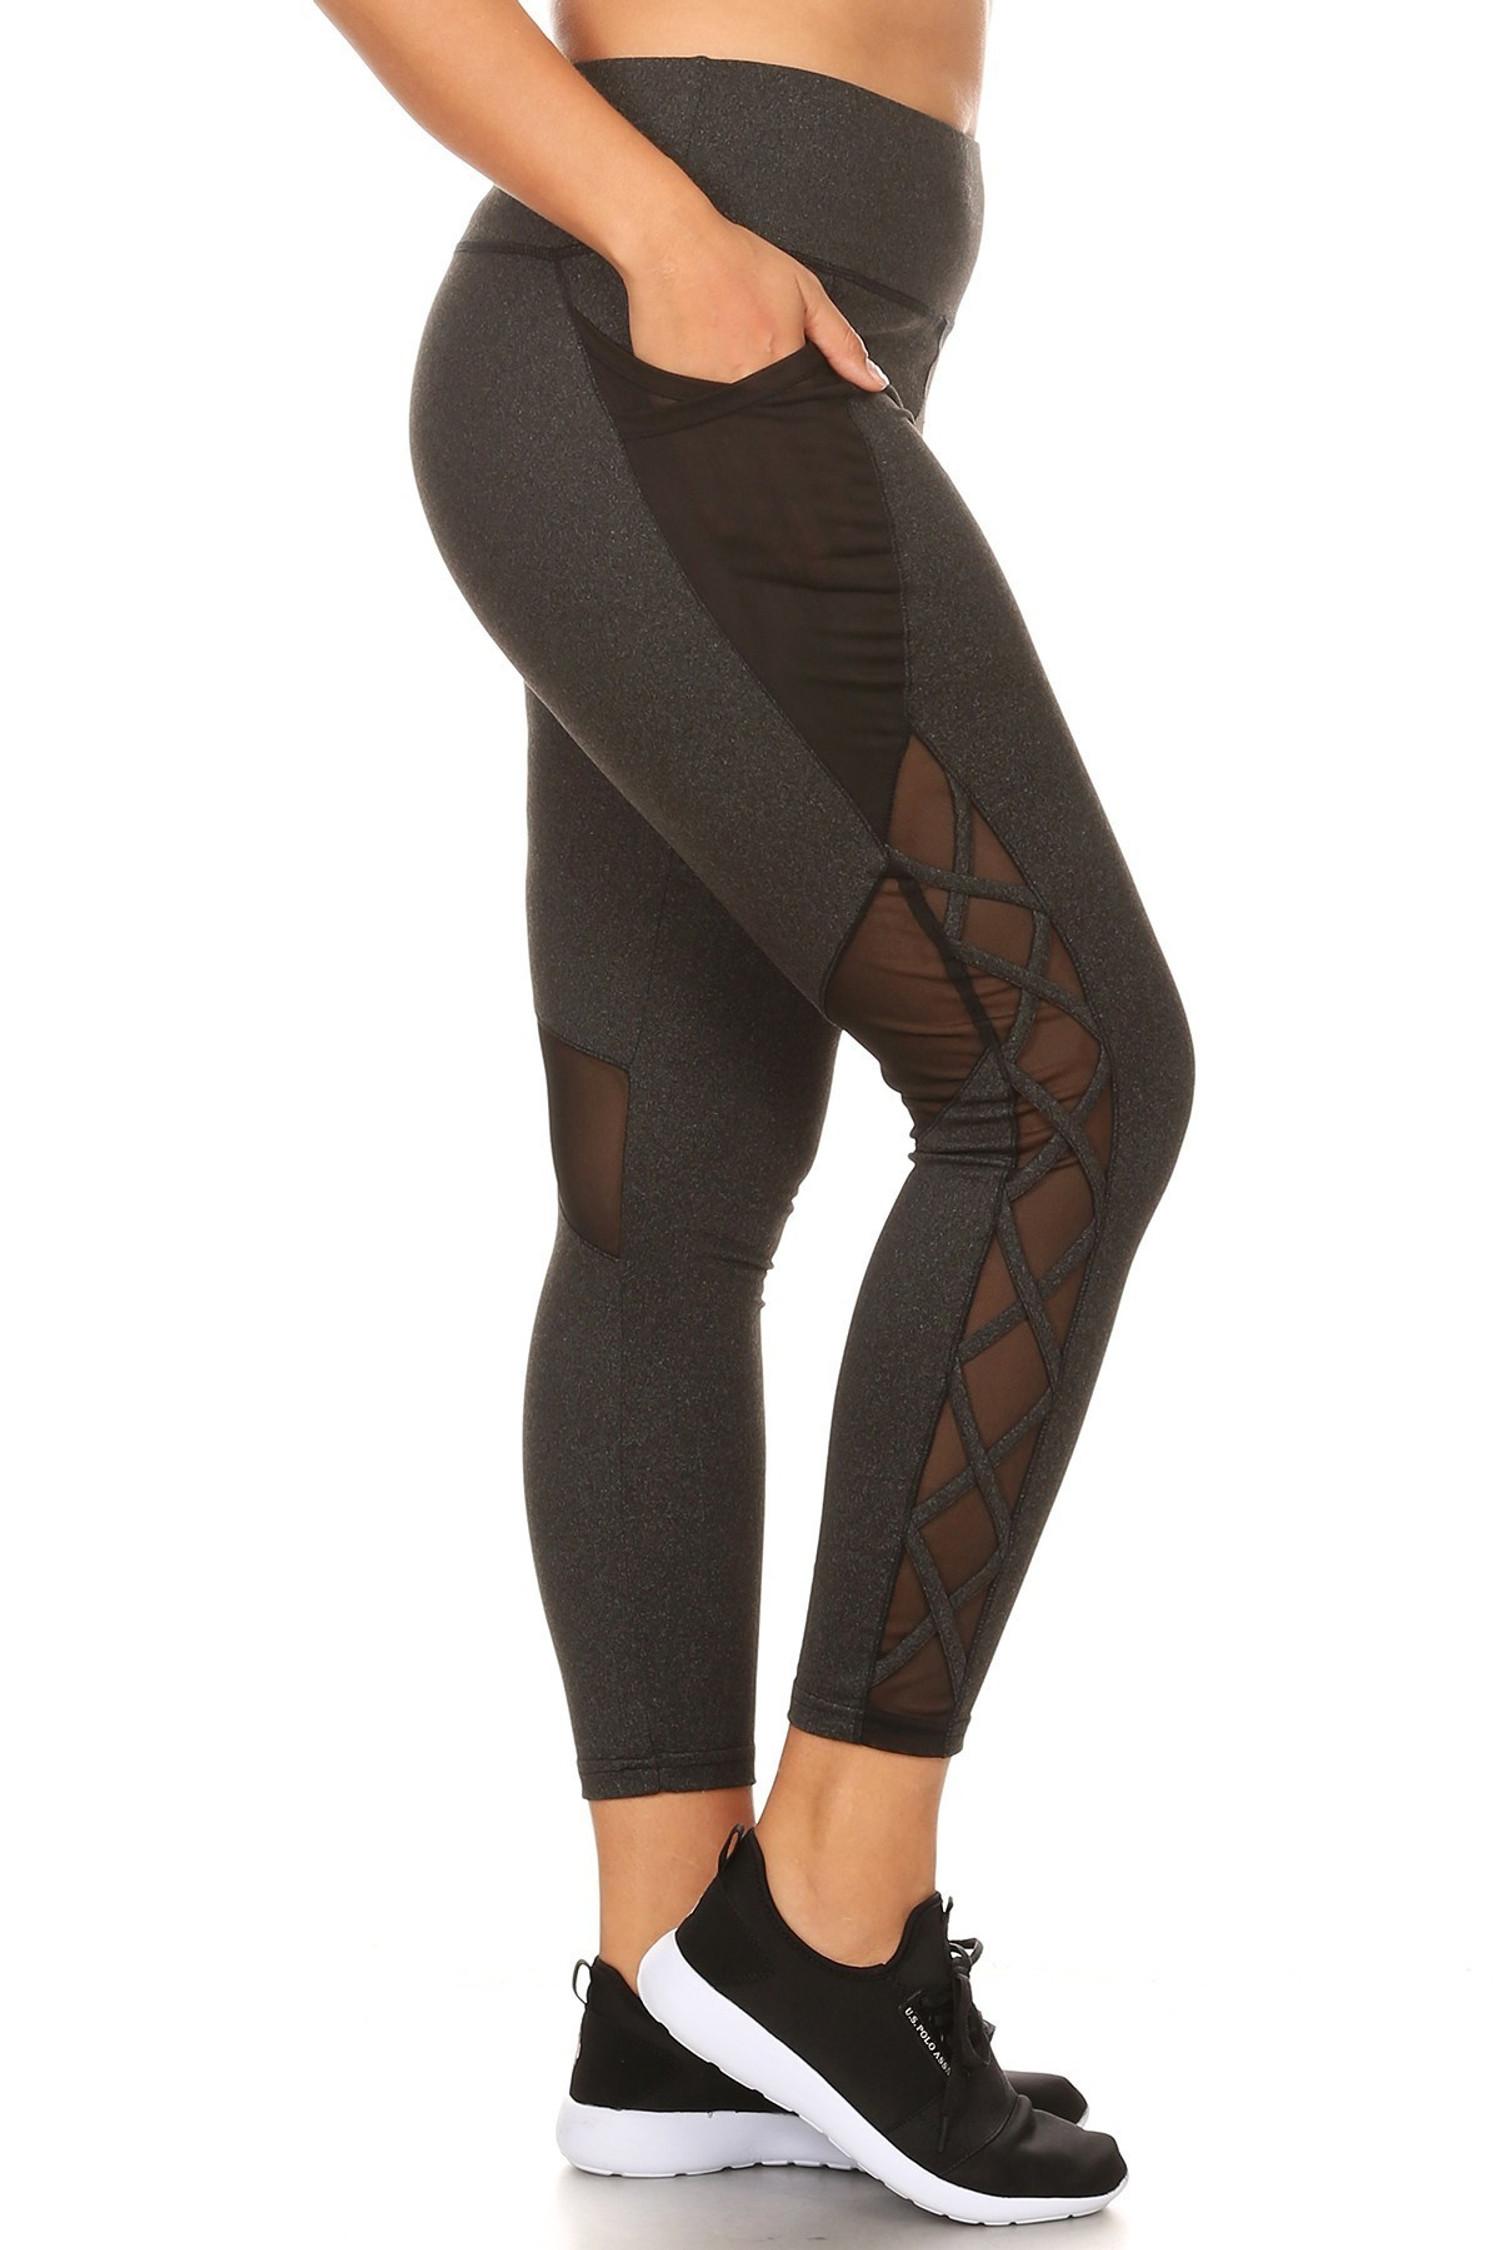 Crisscross Rear Knee Mesh with Pockets Plus Size Workout Leggings